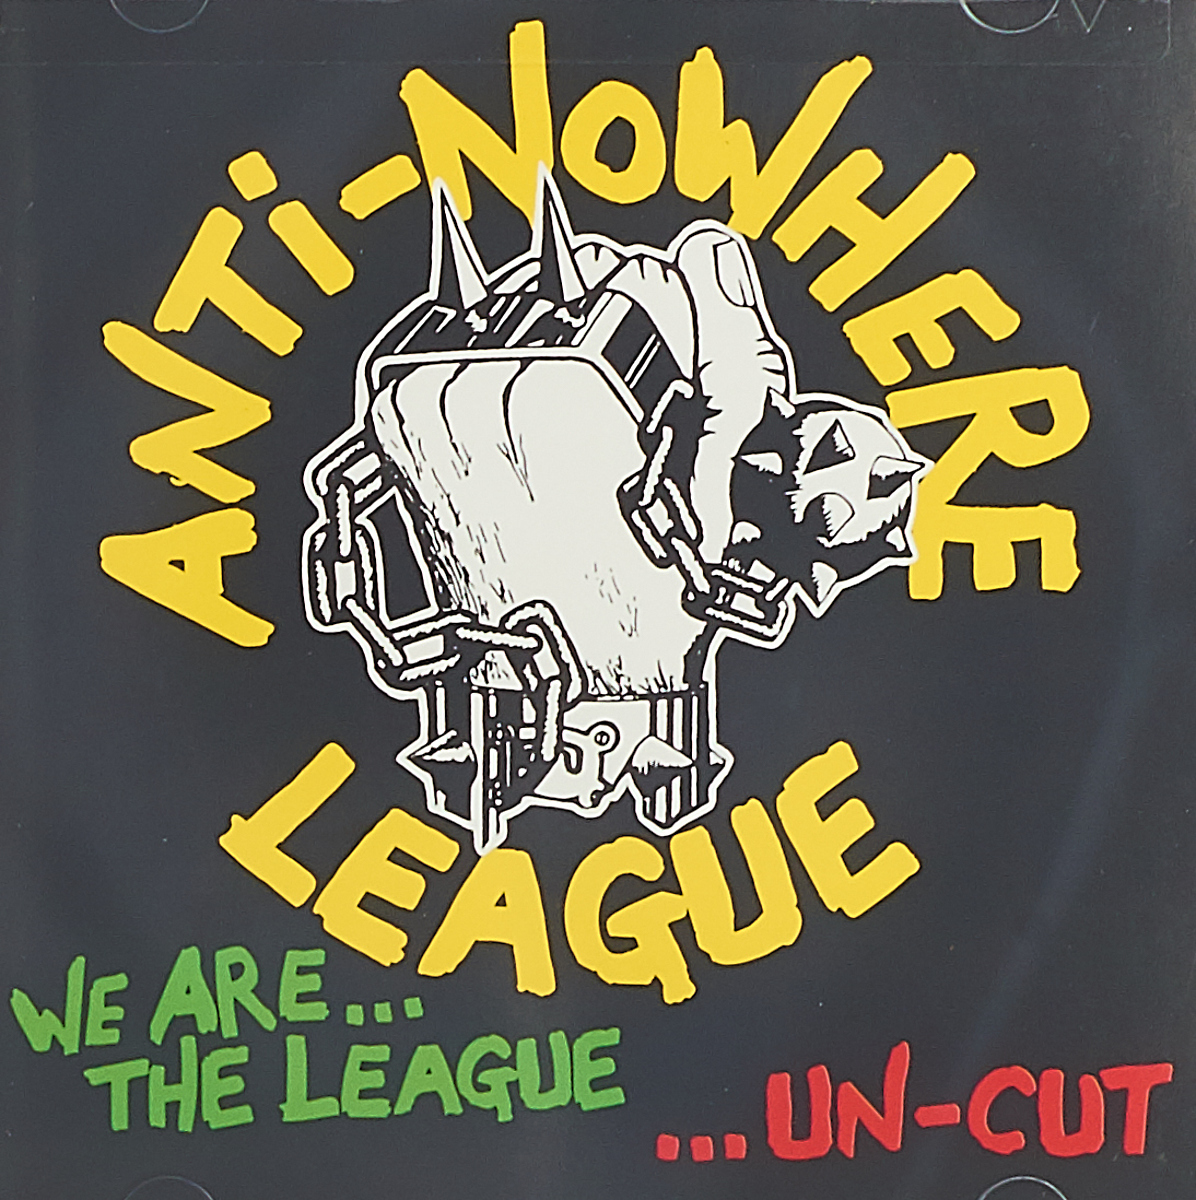 Anti Nowhere League Anti-Nowhere League. We Are... The League...Un-cut